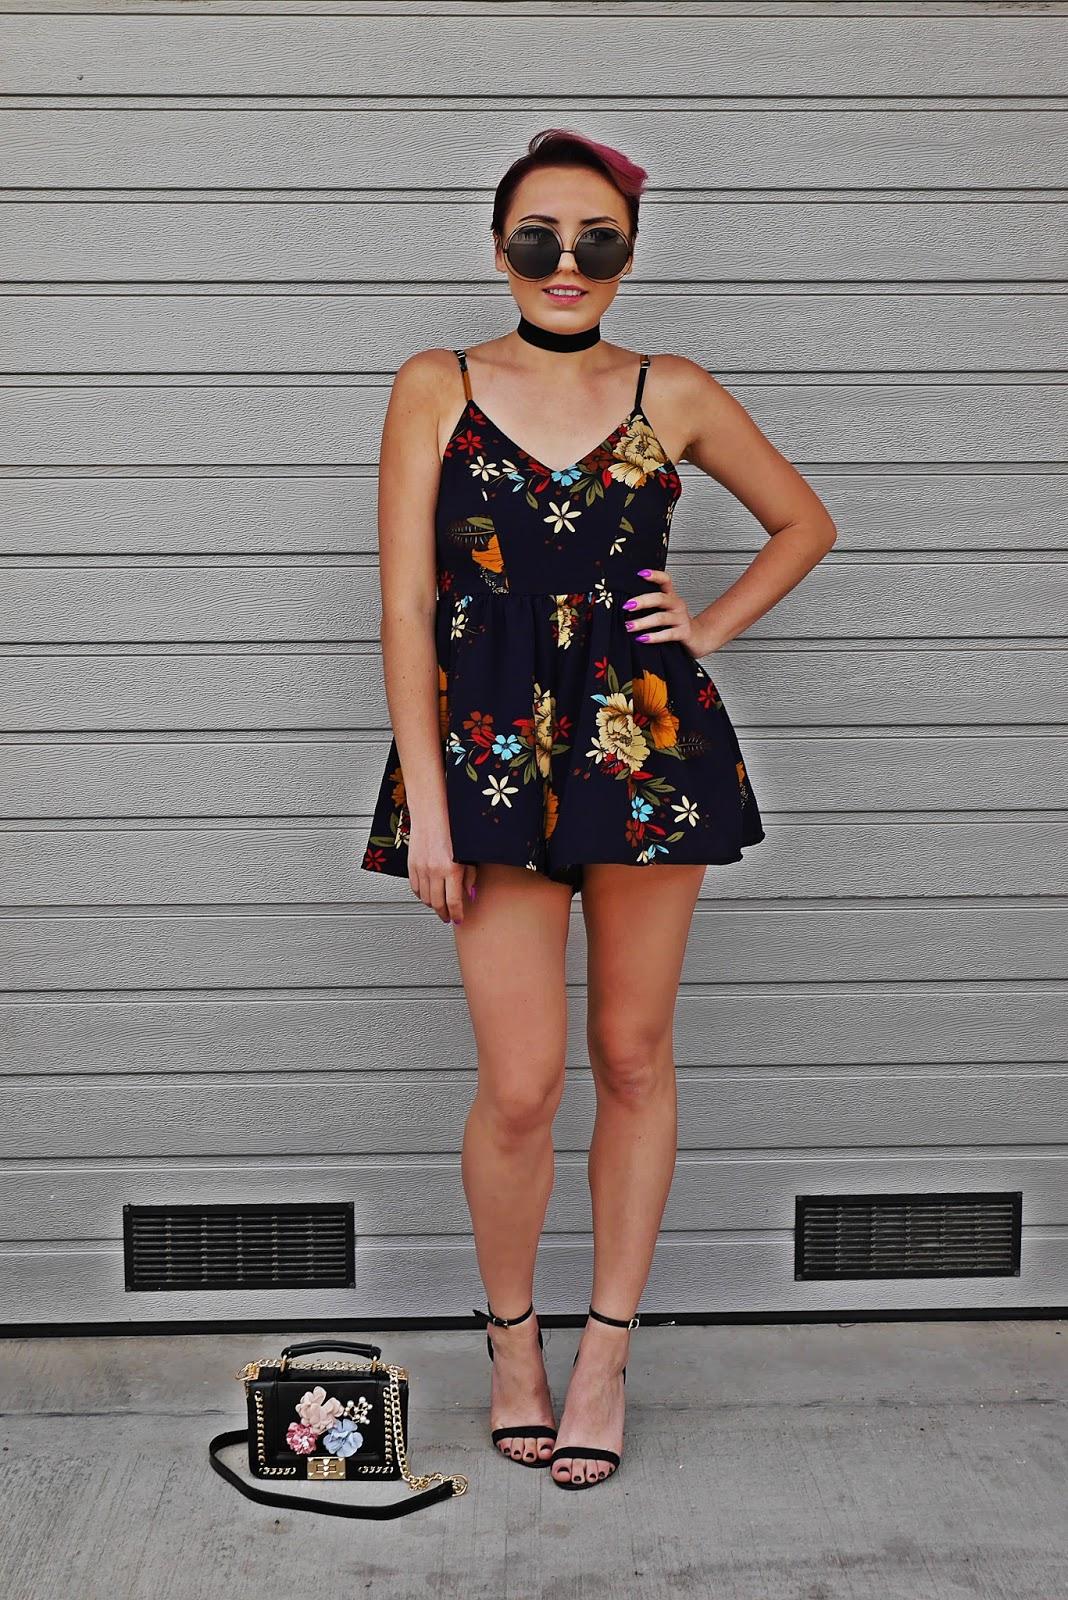 zaful_floral_romper_high_heels_choker_karyn_blog_modowy_210617b